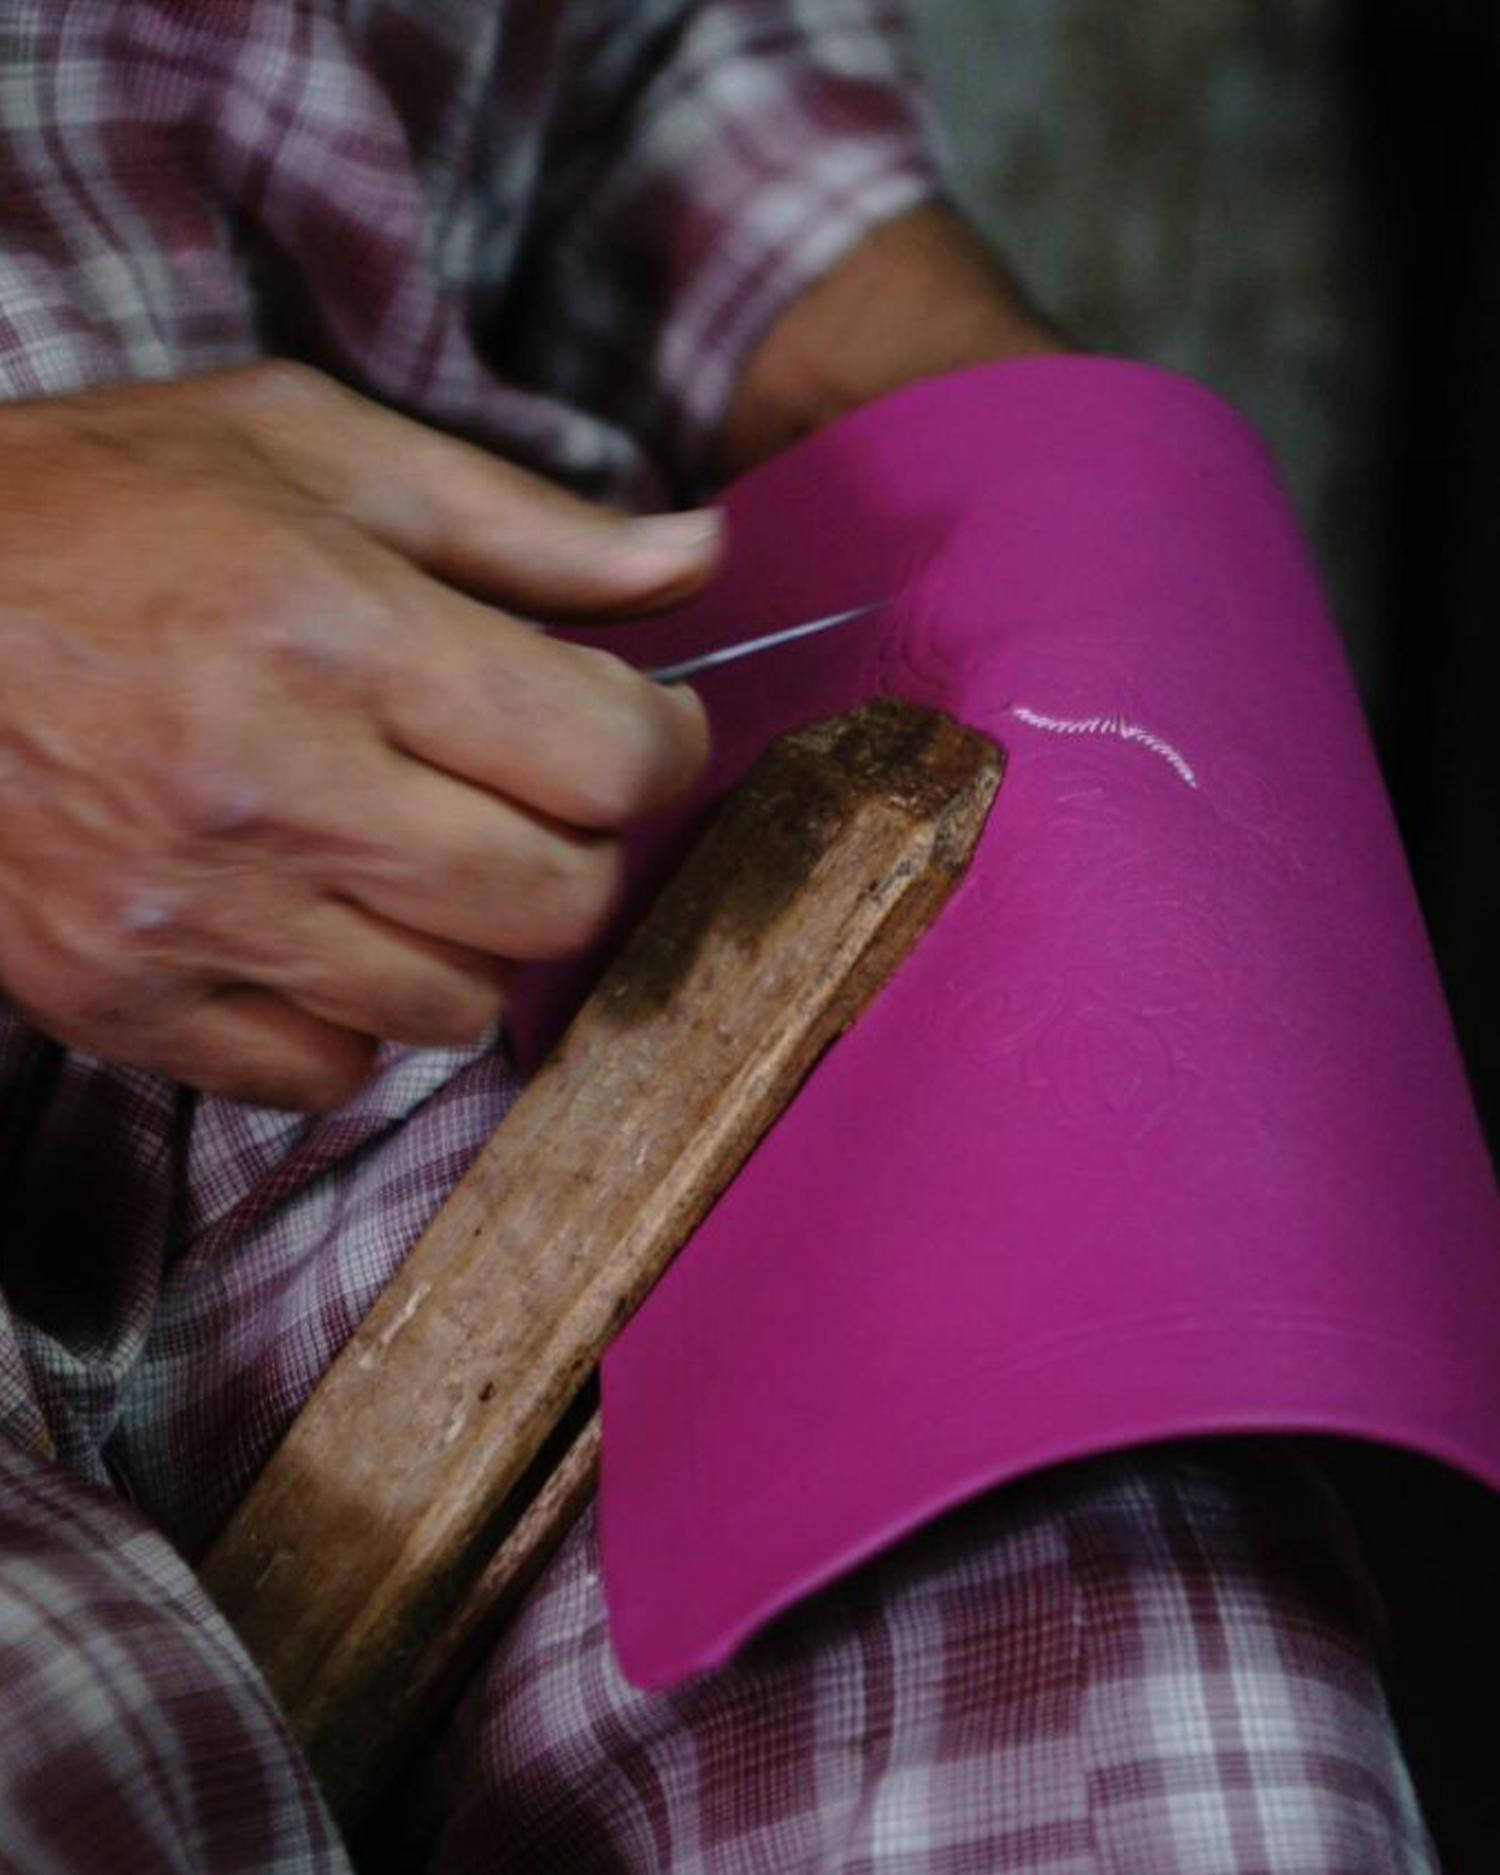 pink-berber-bag-abury.jpg